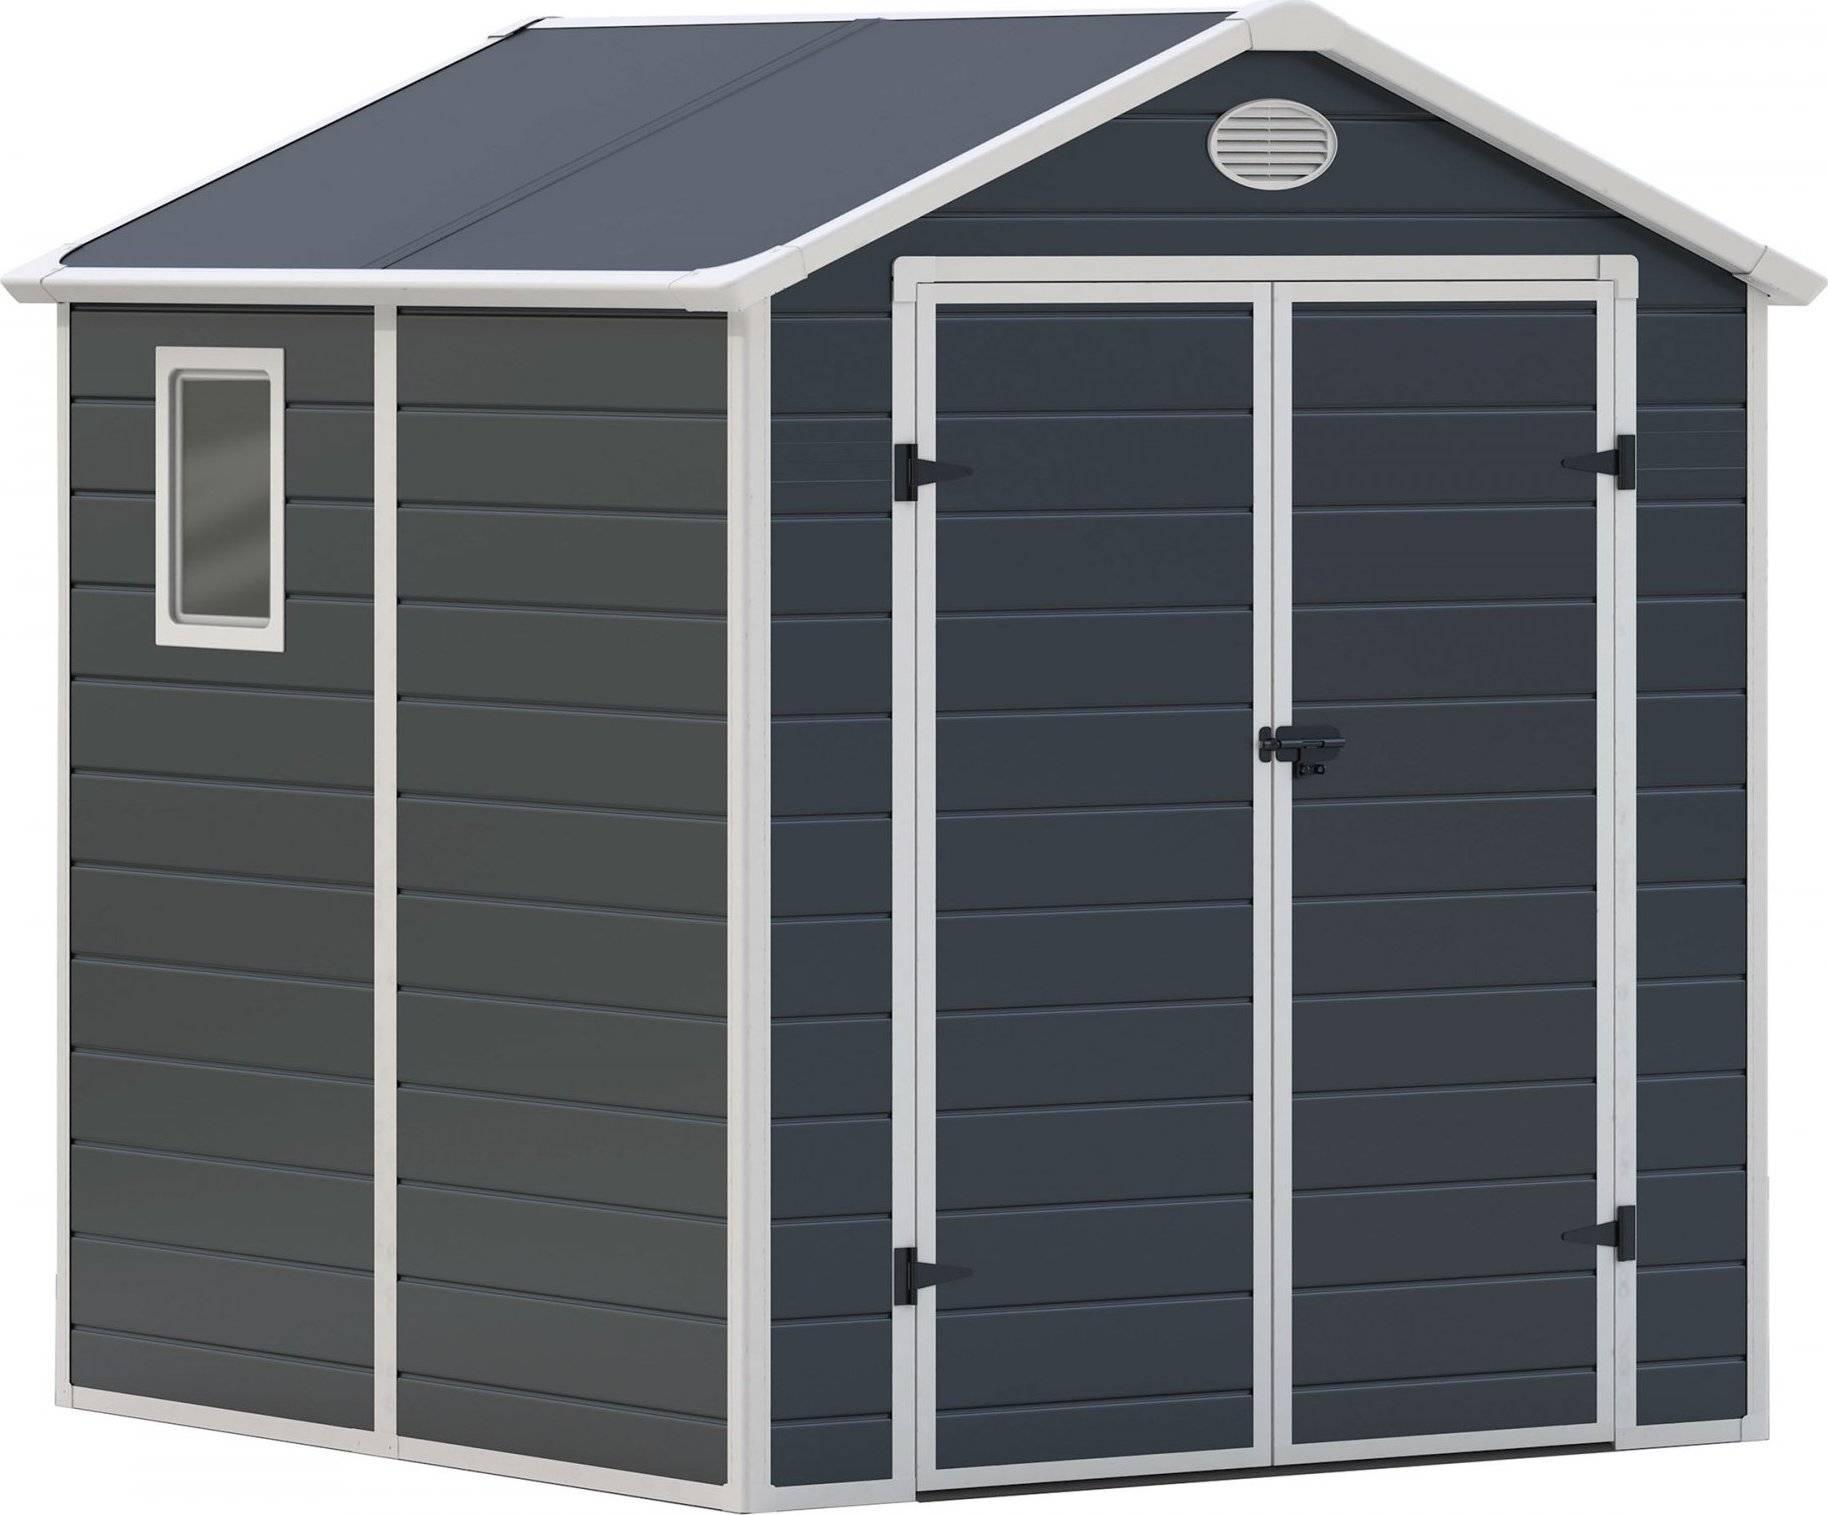 Zahradní domek PAH 357 - 188 x 190 cm, plastový, šedý 6390036 G21